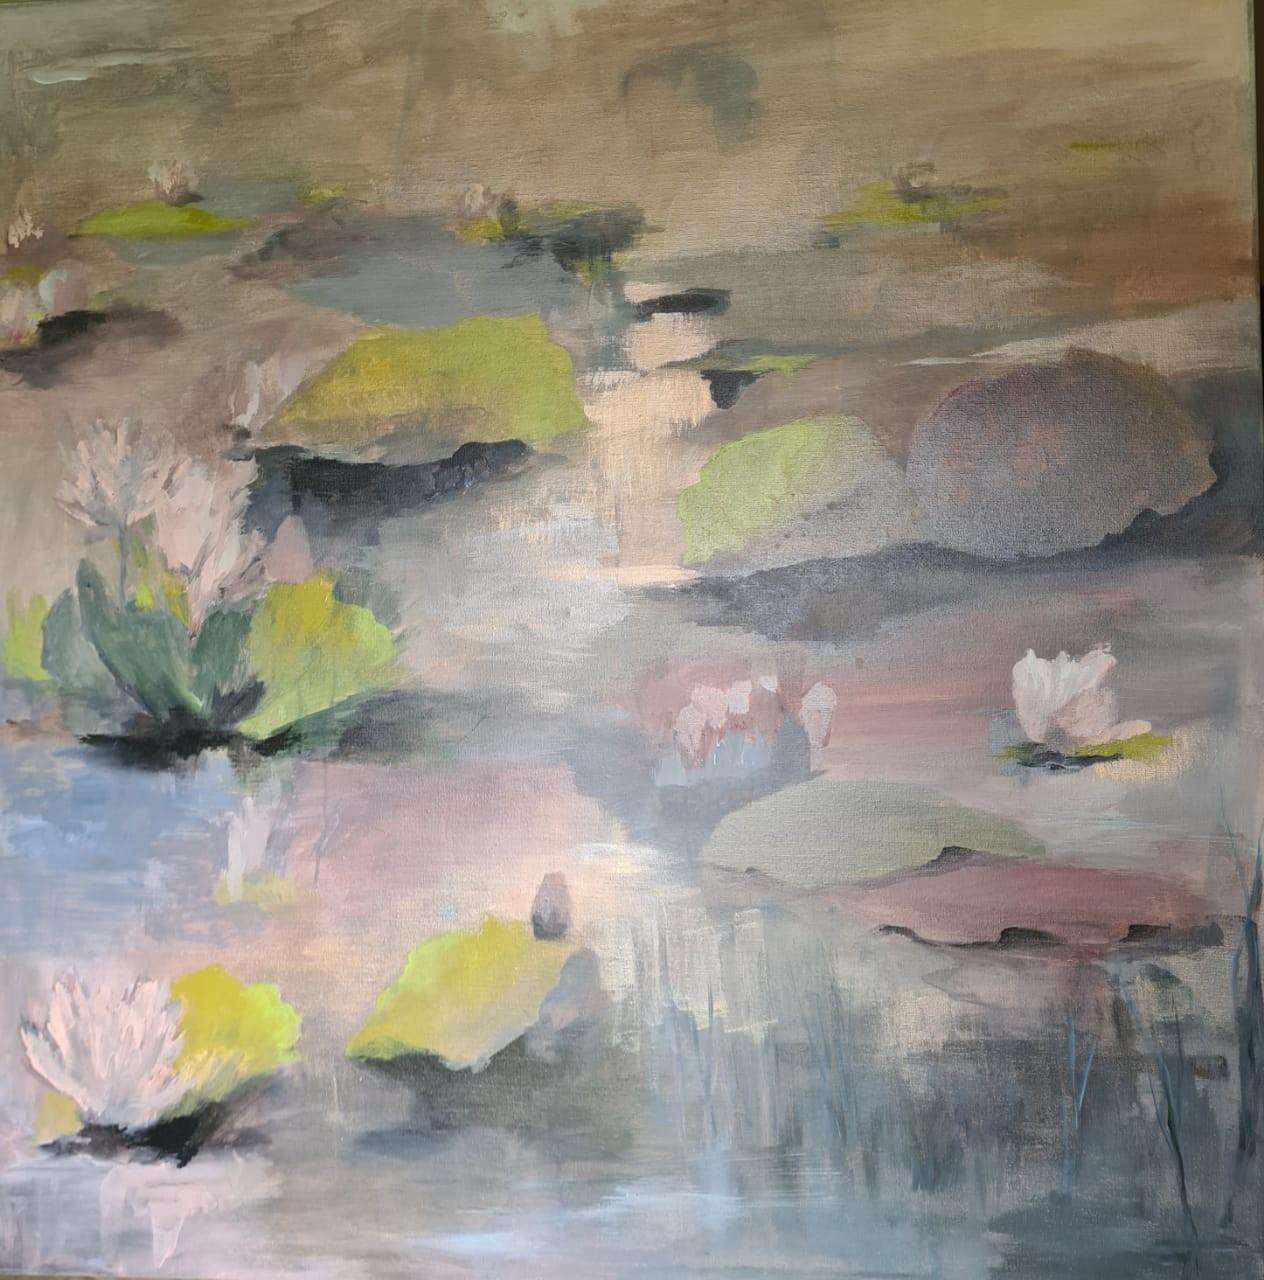 Water lilies at dusk by Jean wijesekera